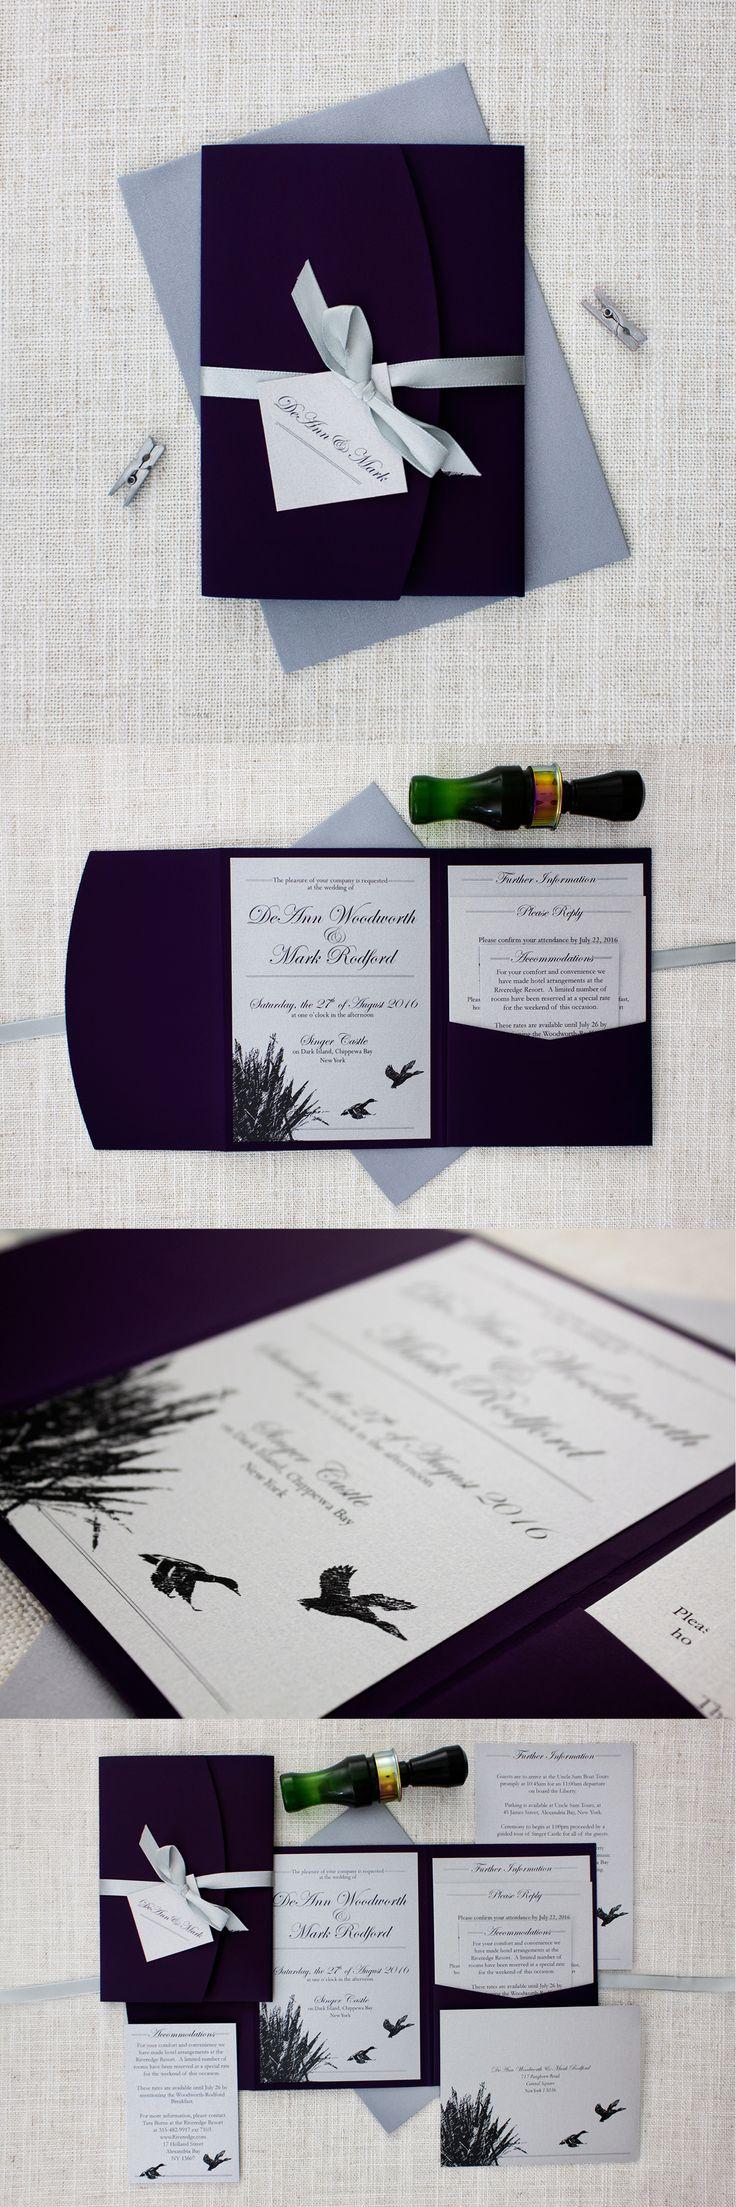 Deep Purple and Silver Duck Shooting Pocketfold Wedding Invitations http://bemyguest.co.nz/archives/item/darling-ducks-purple-pocketfold-wedding-invitation/